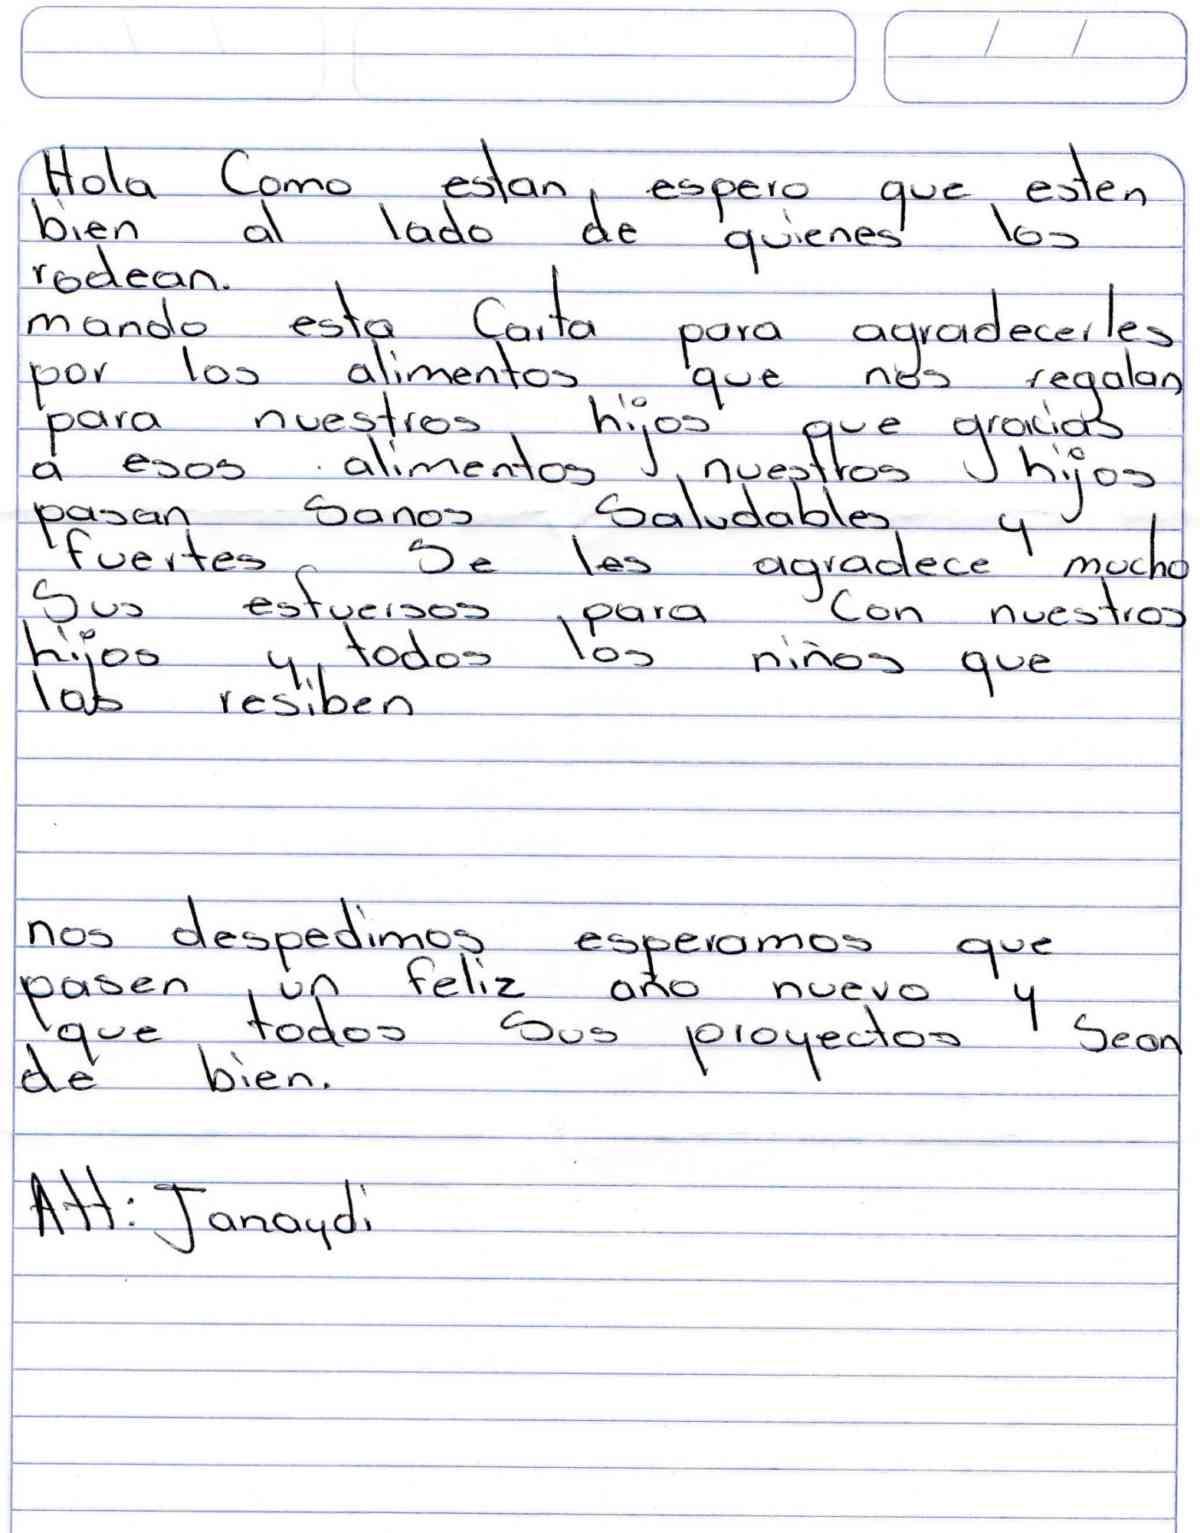 Monjaras 4 10 2016 Letter Edited